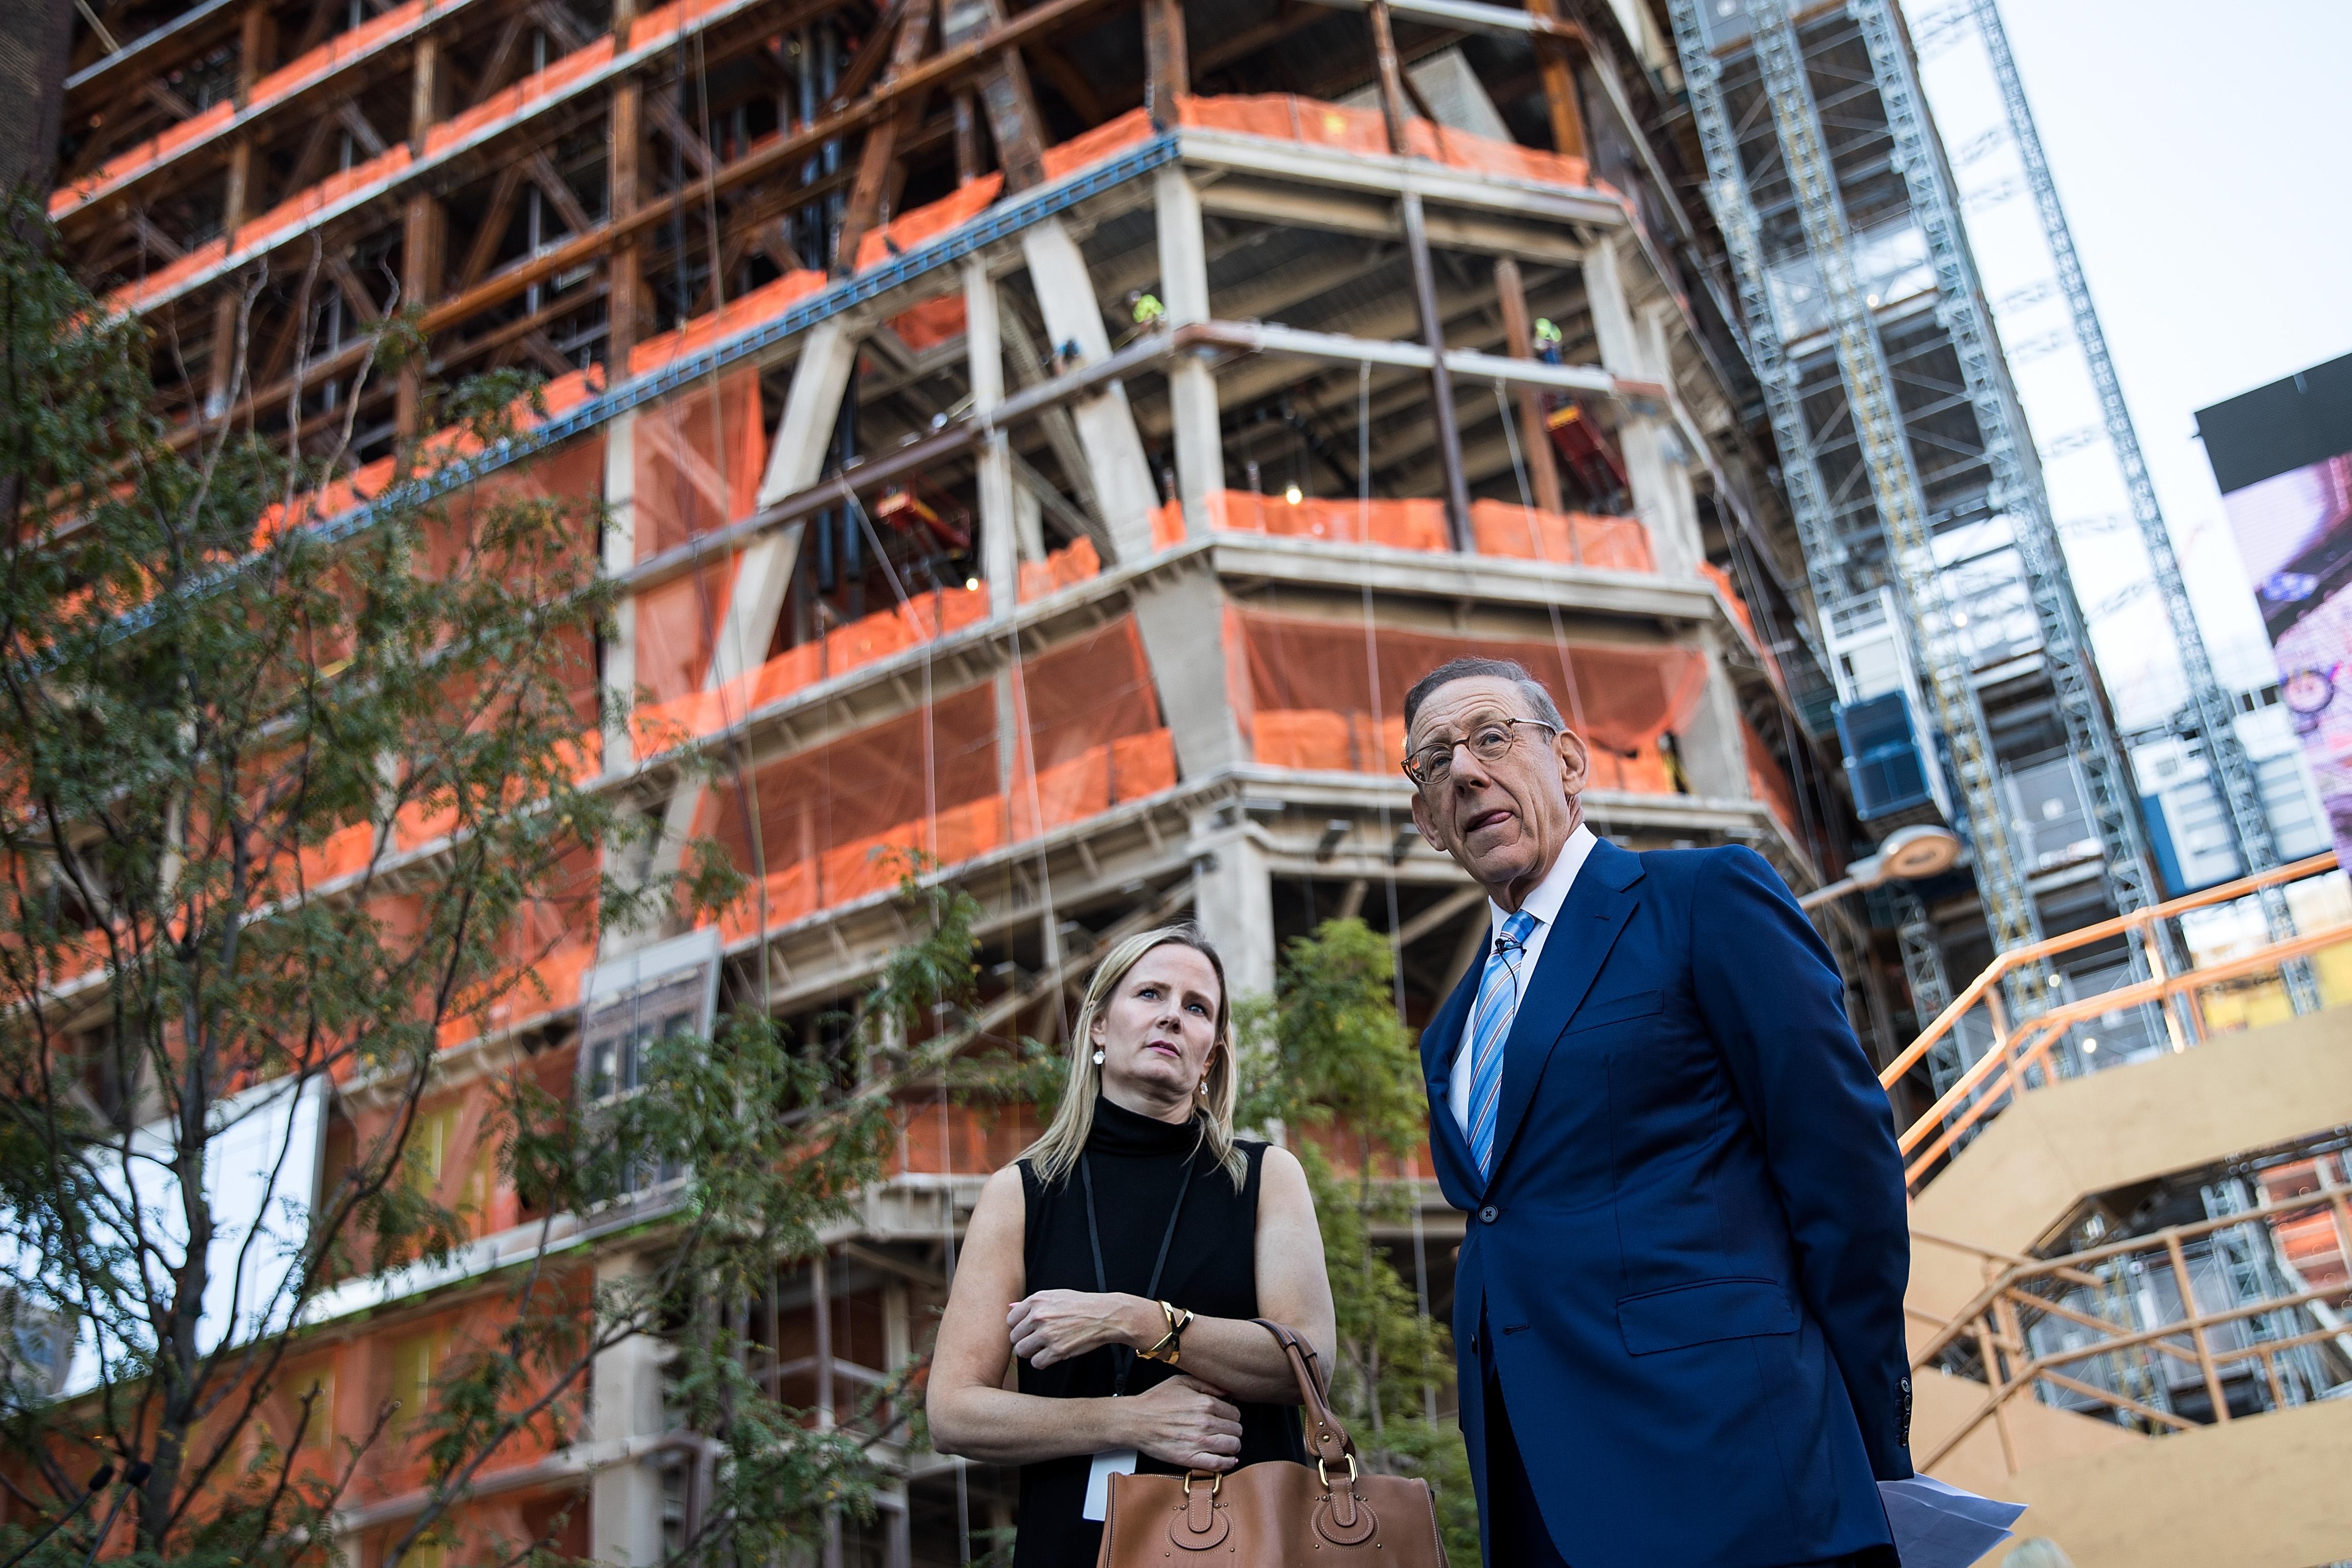 Mayor De Blasio Attends Unveils Of Plans For New Park Area In Hudson Yards Neighborhood